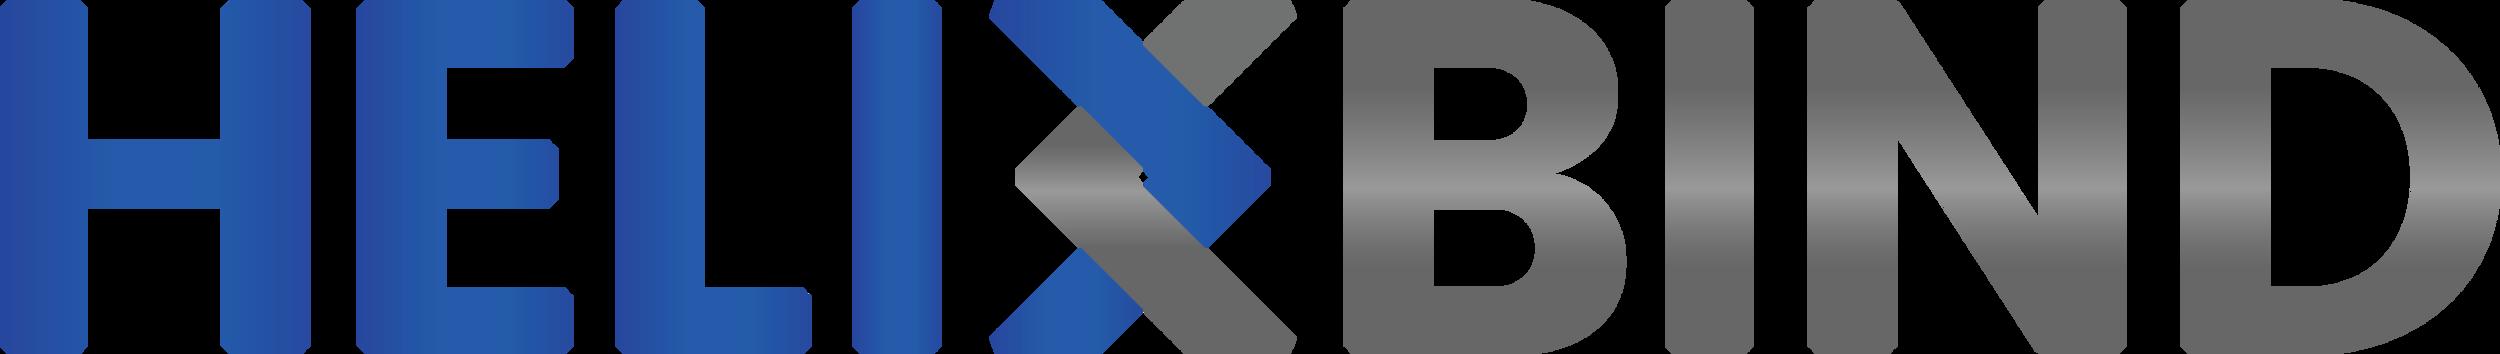 HelixBind_Logo_AS2-no BG.png